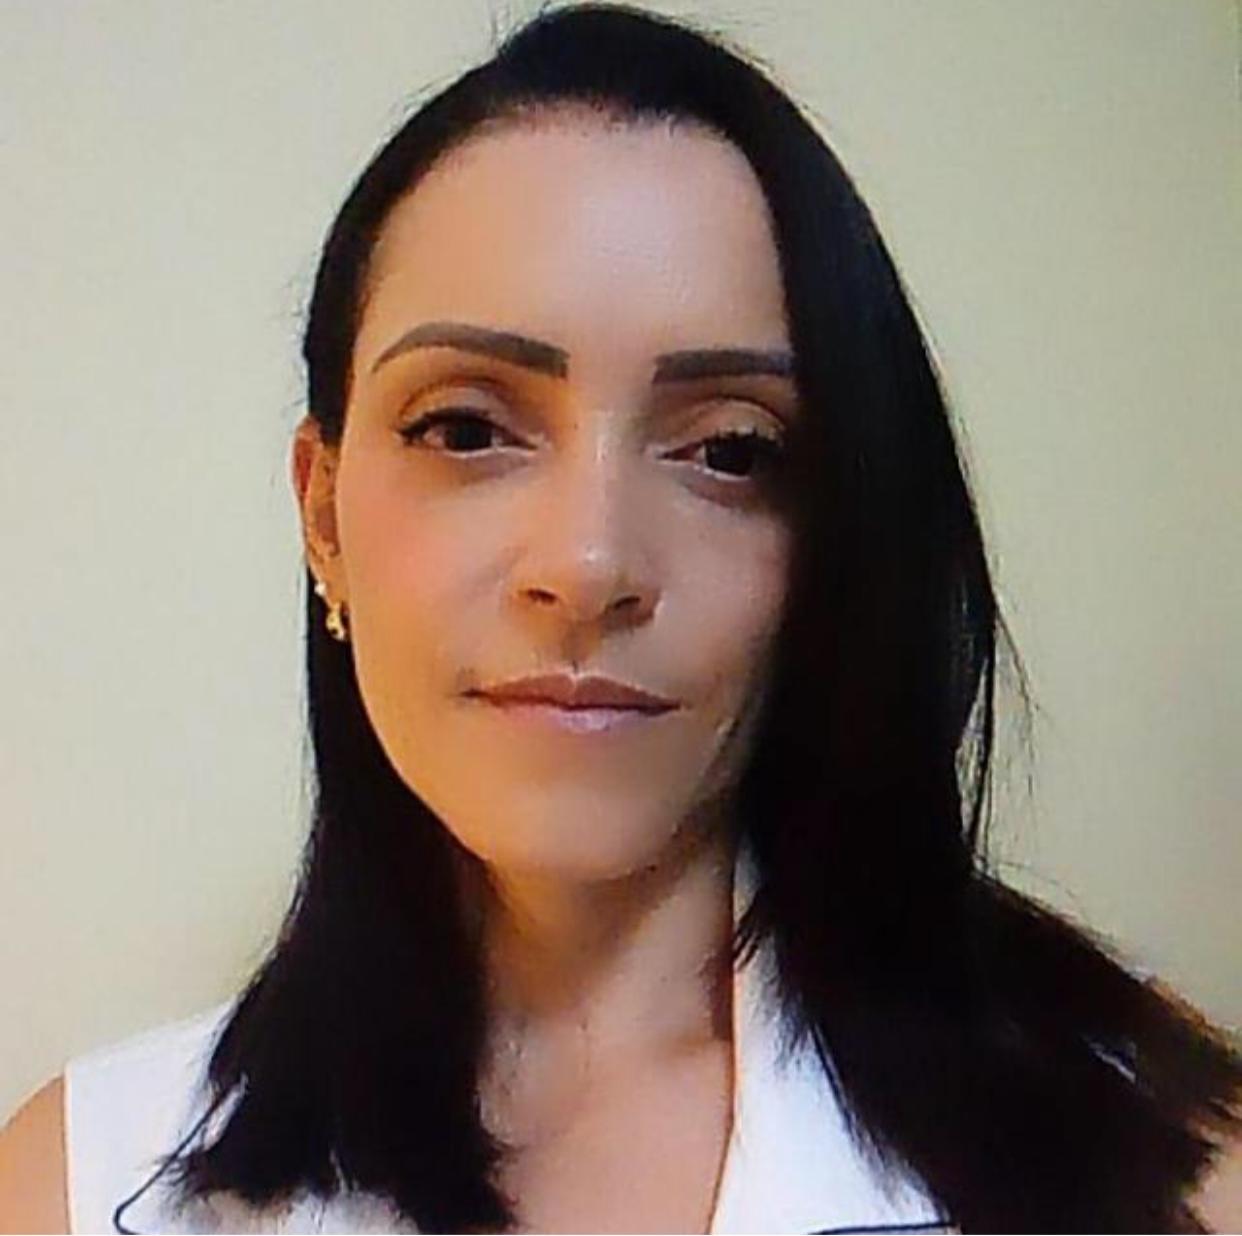 Priscilla Carvalho